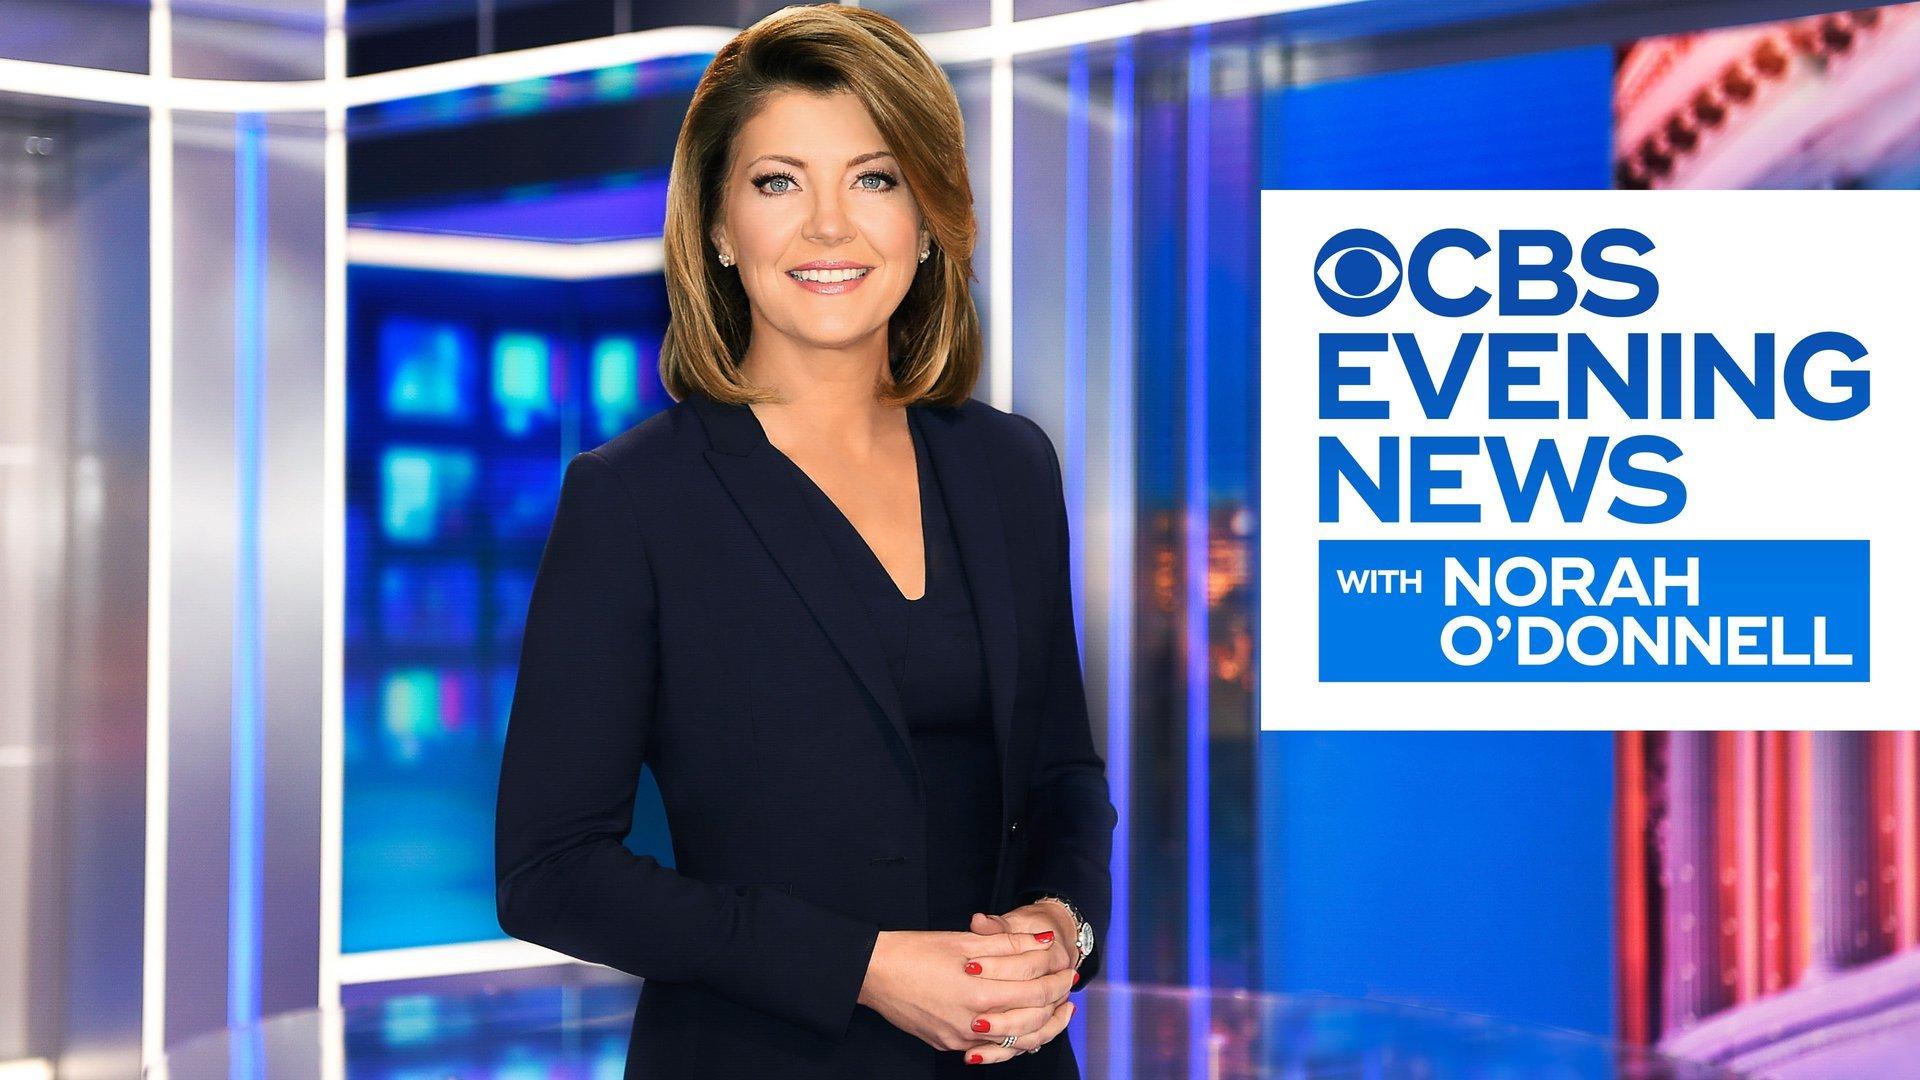 CBS Evening News - CBS